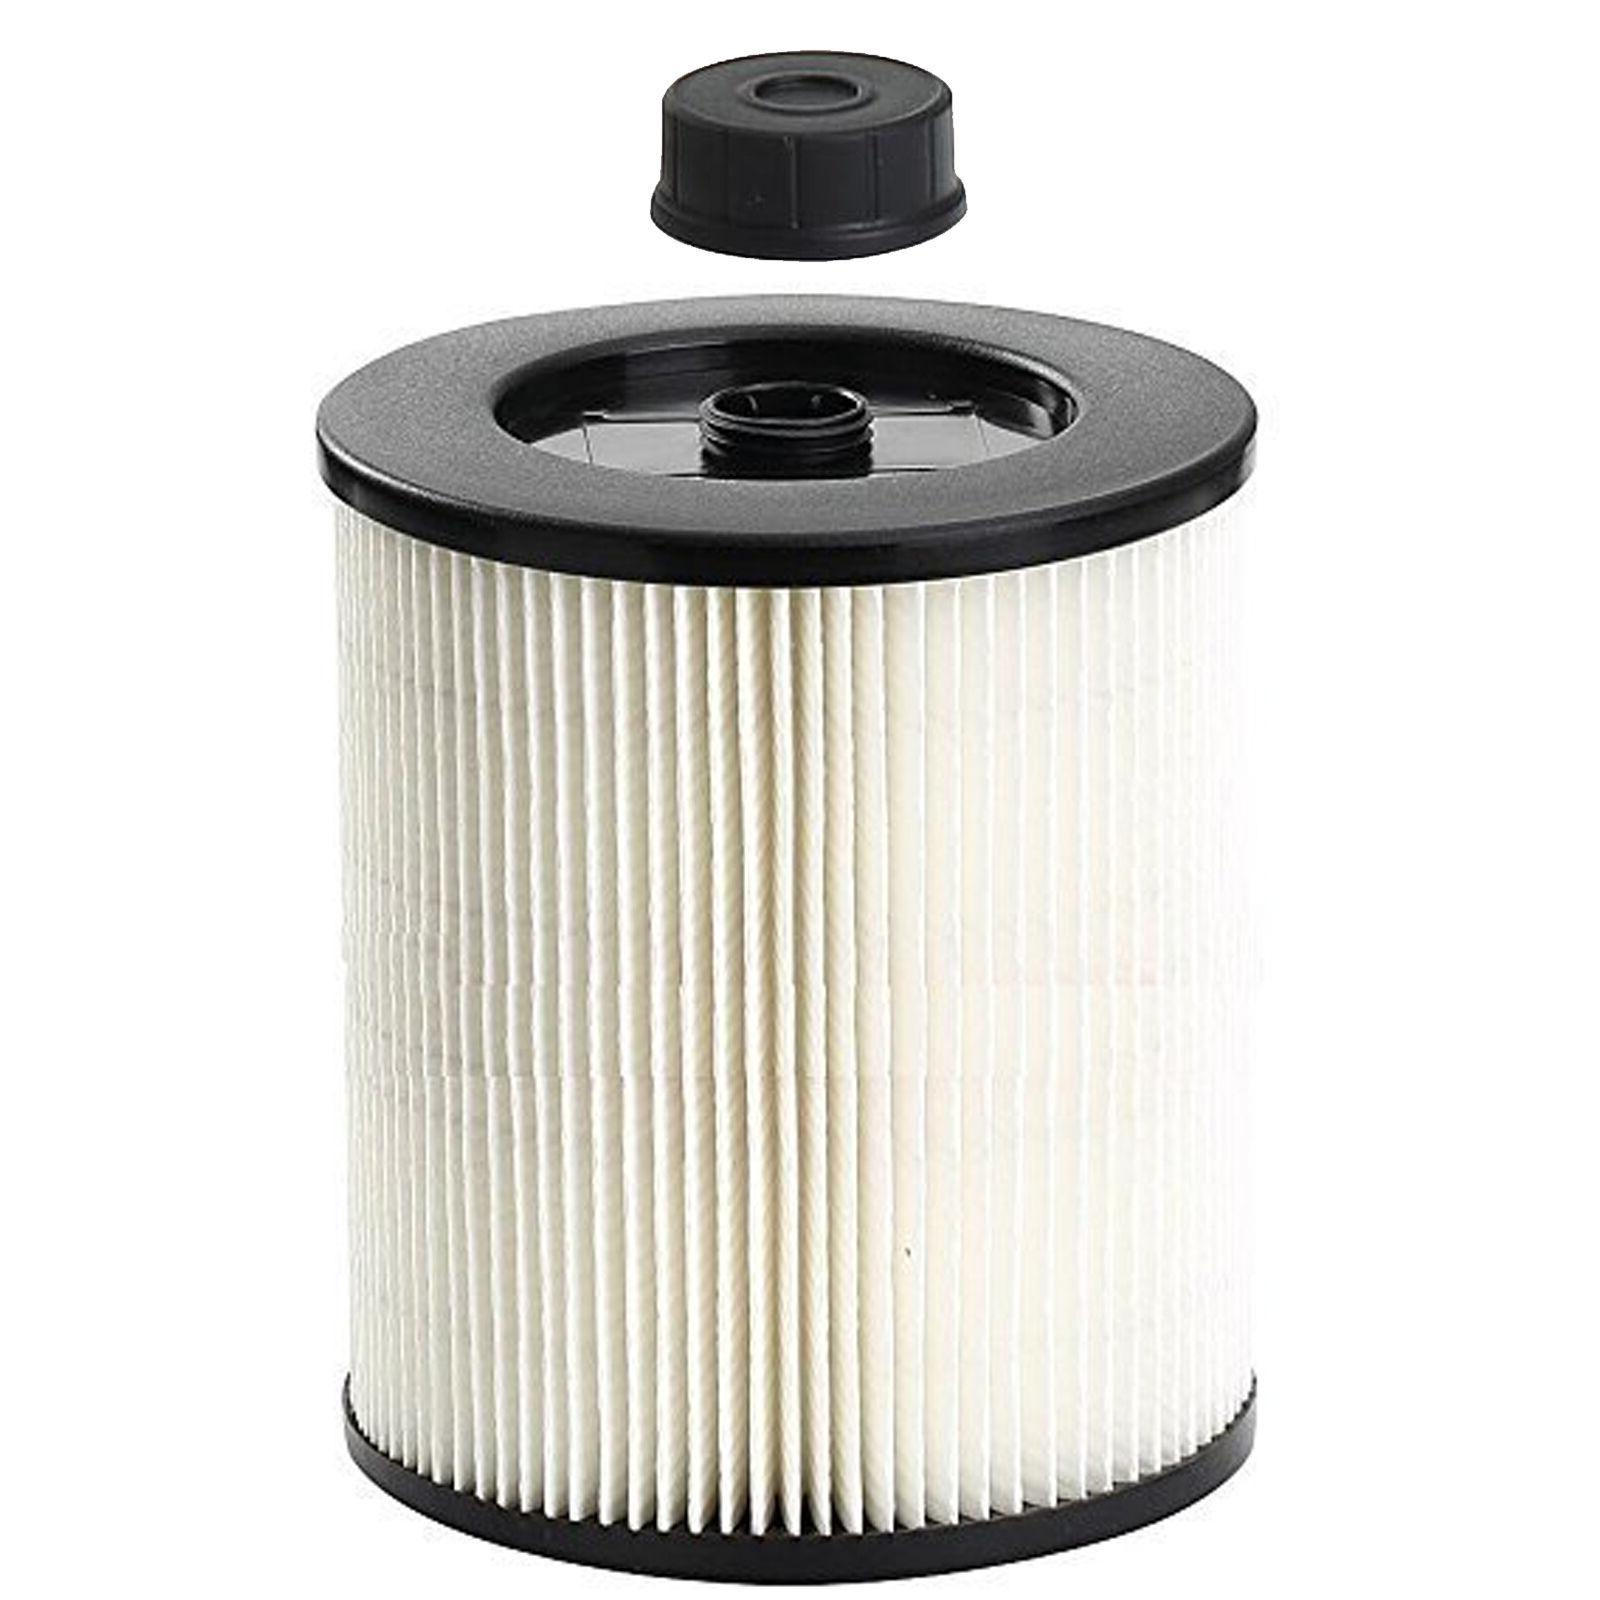 vacuum filter filter for shop vac craftsman